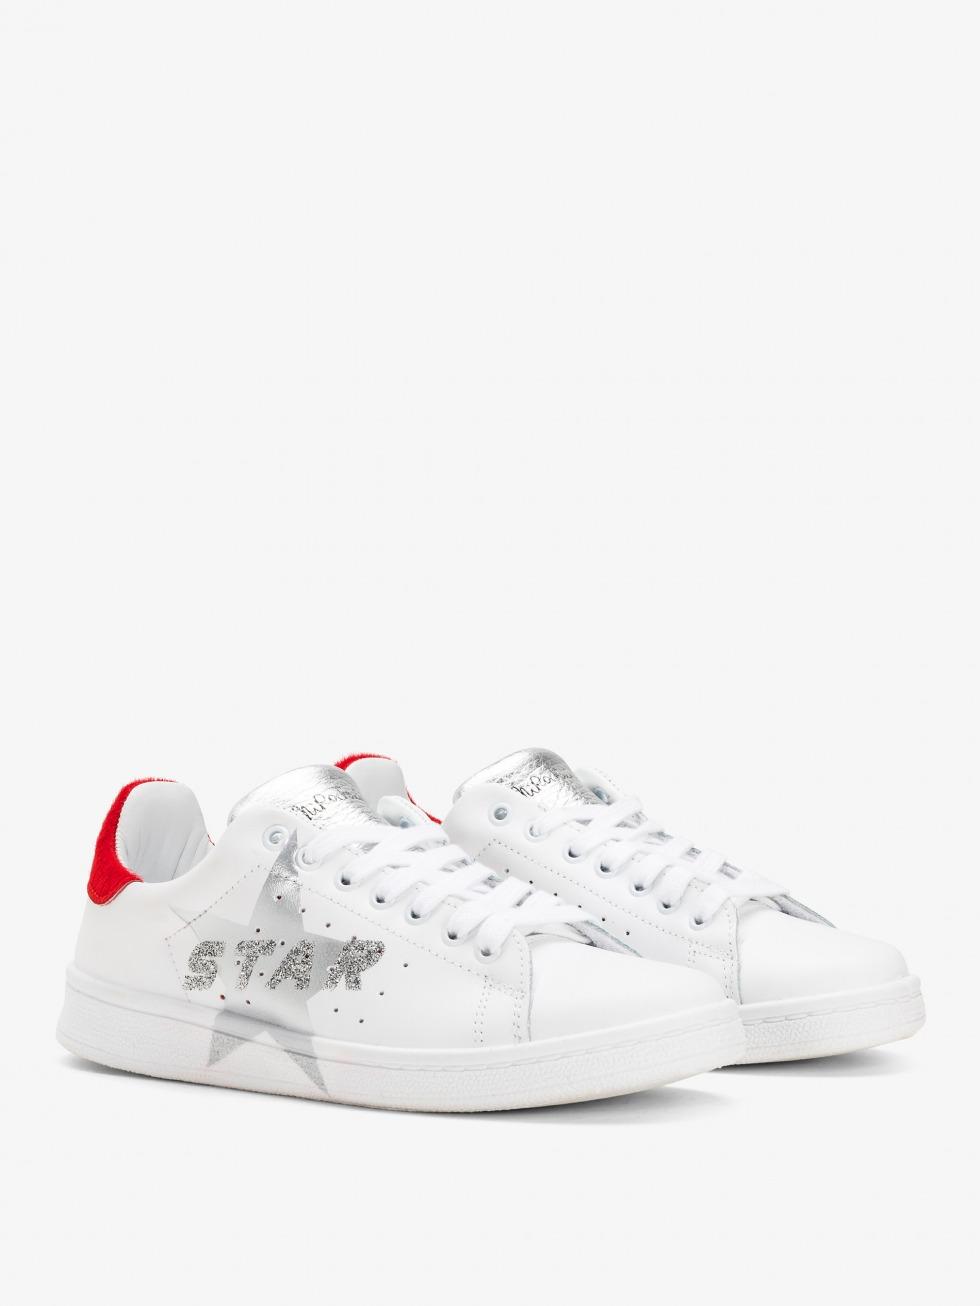 Daiquiri Race Sneakers - Silver Star Race